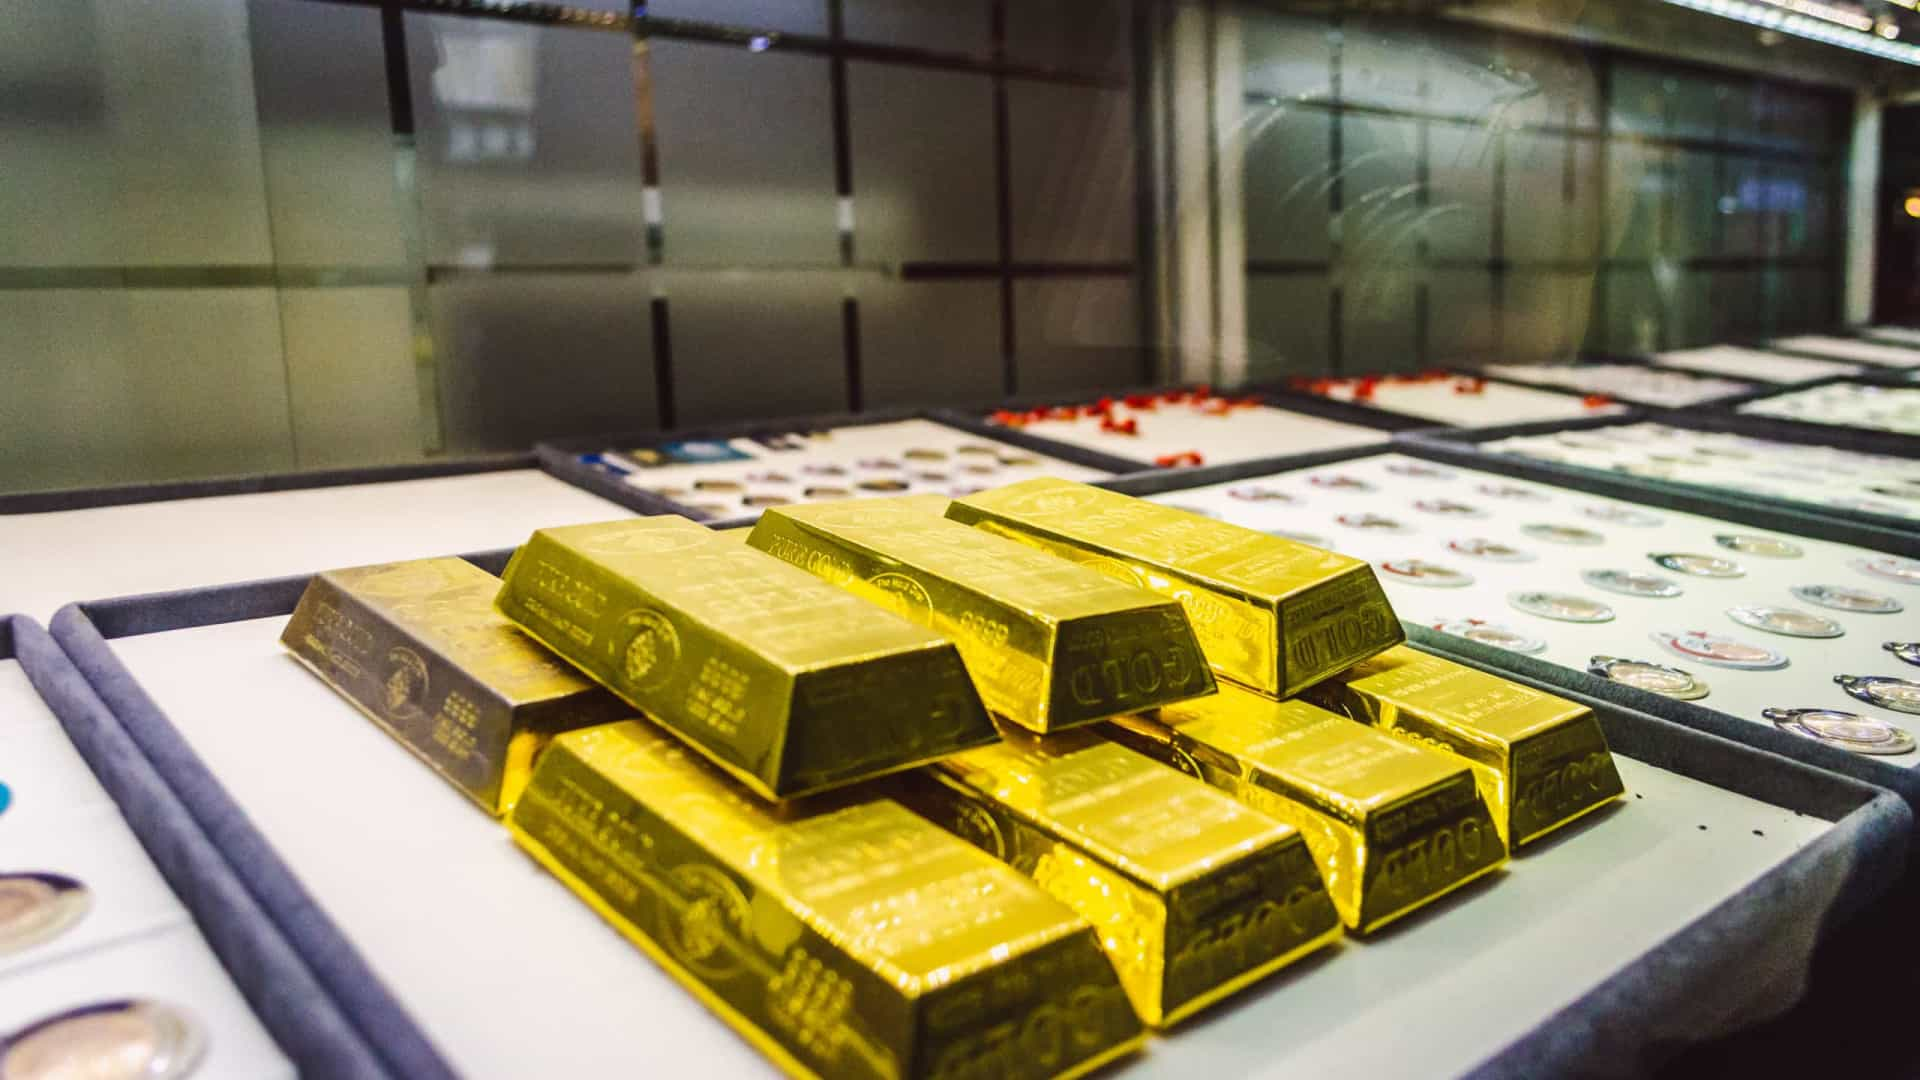 Polícia prende mentor de roubo de 770 quilos de ouro em Guarulhos